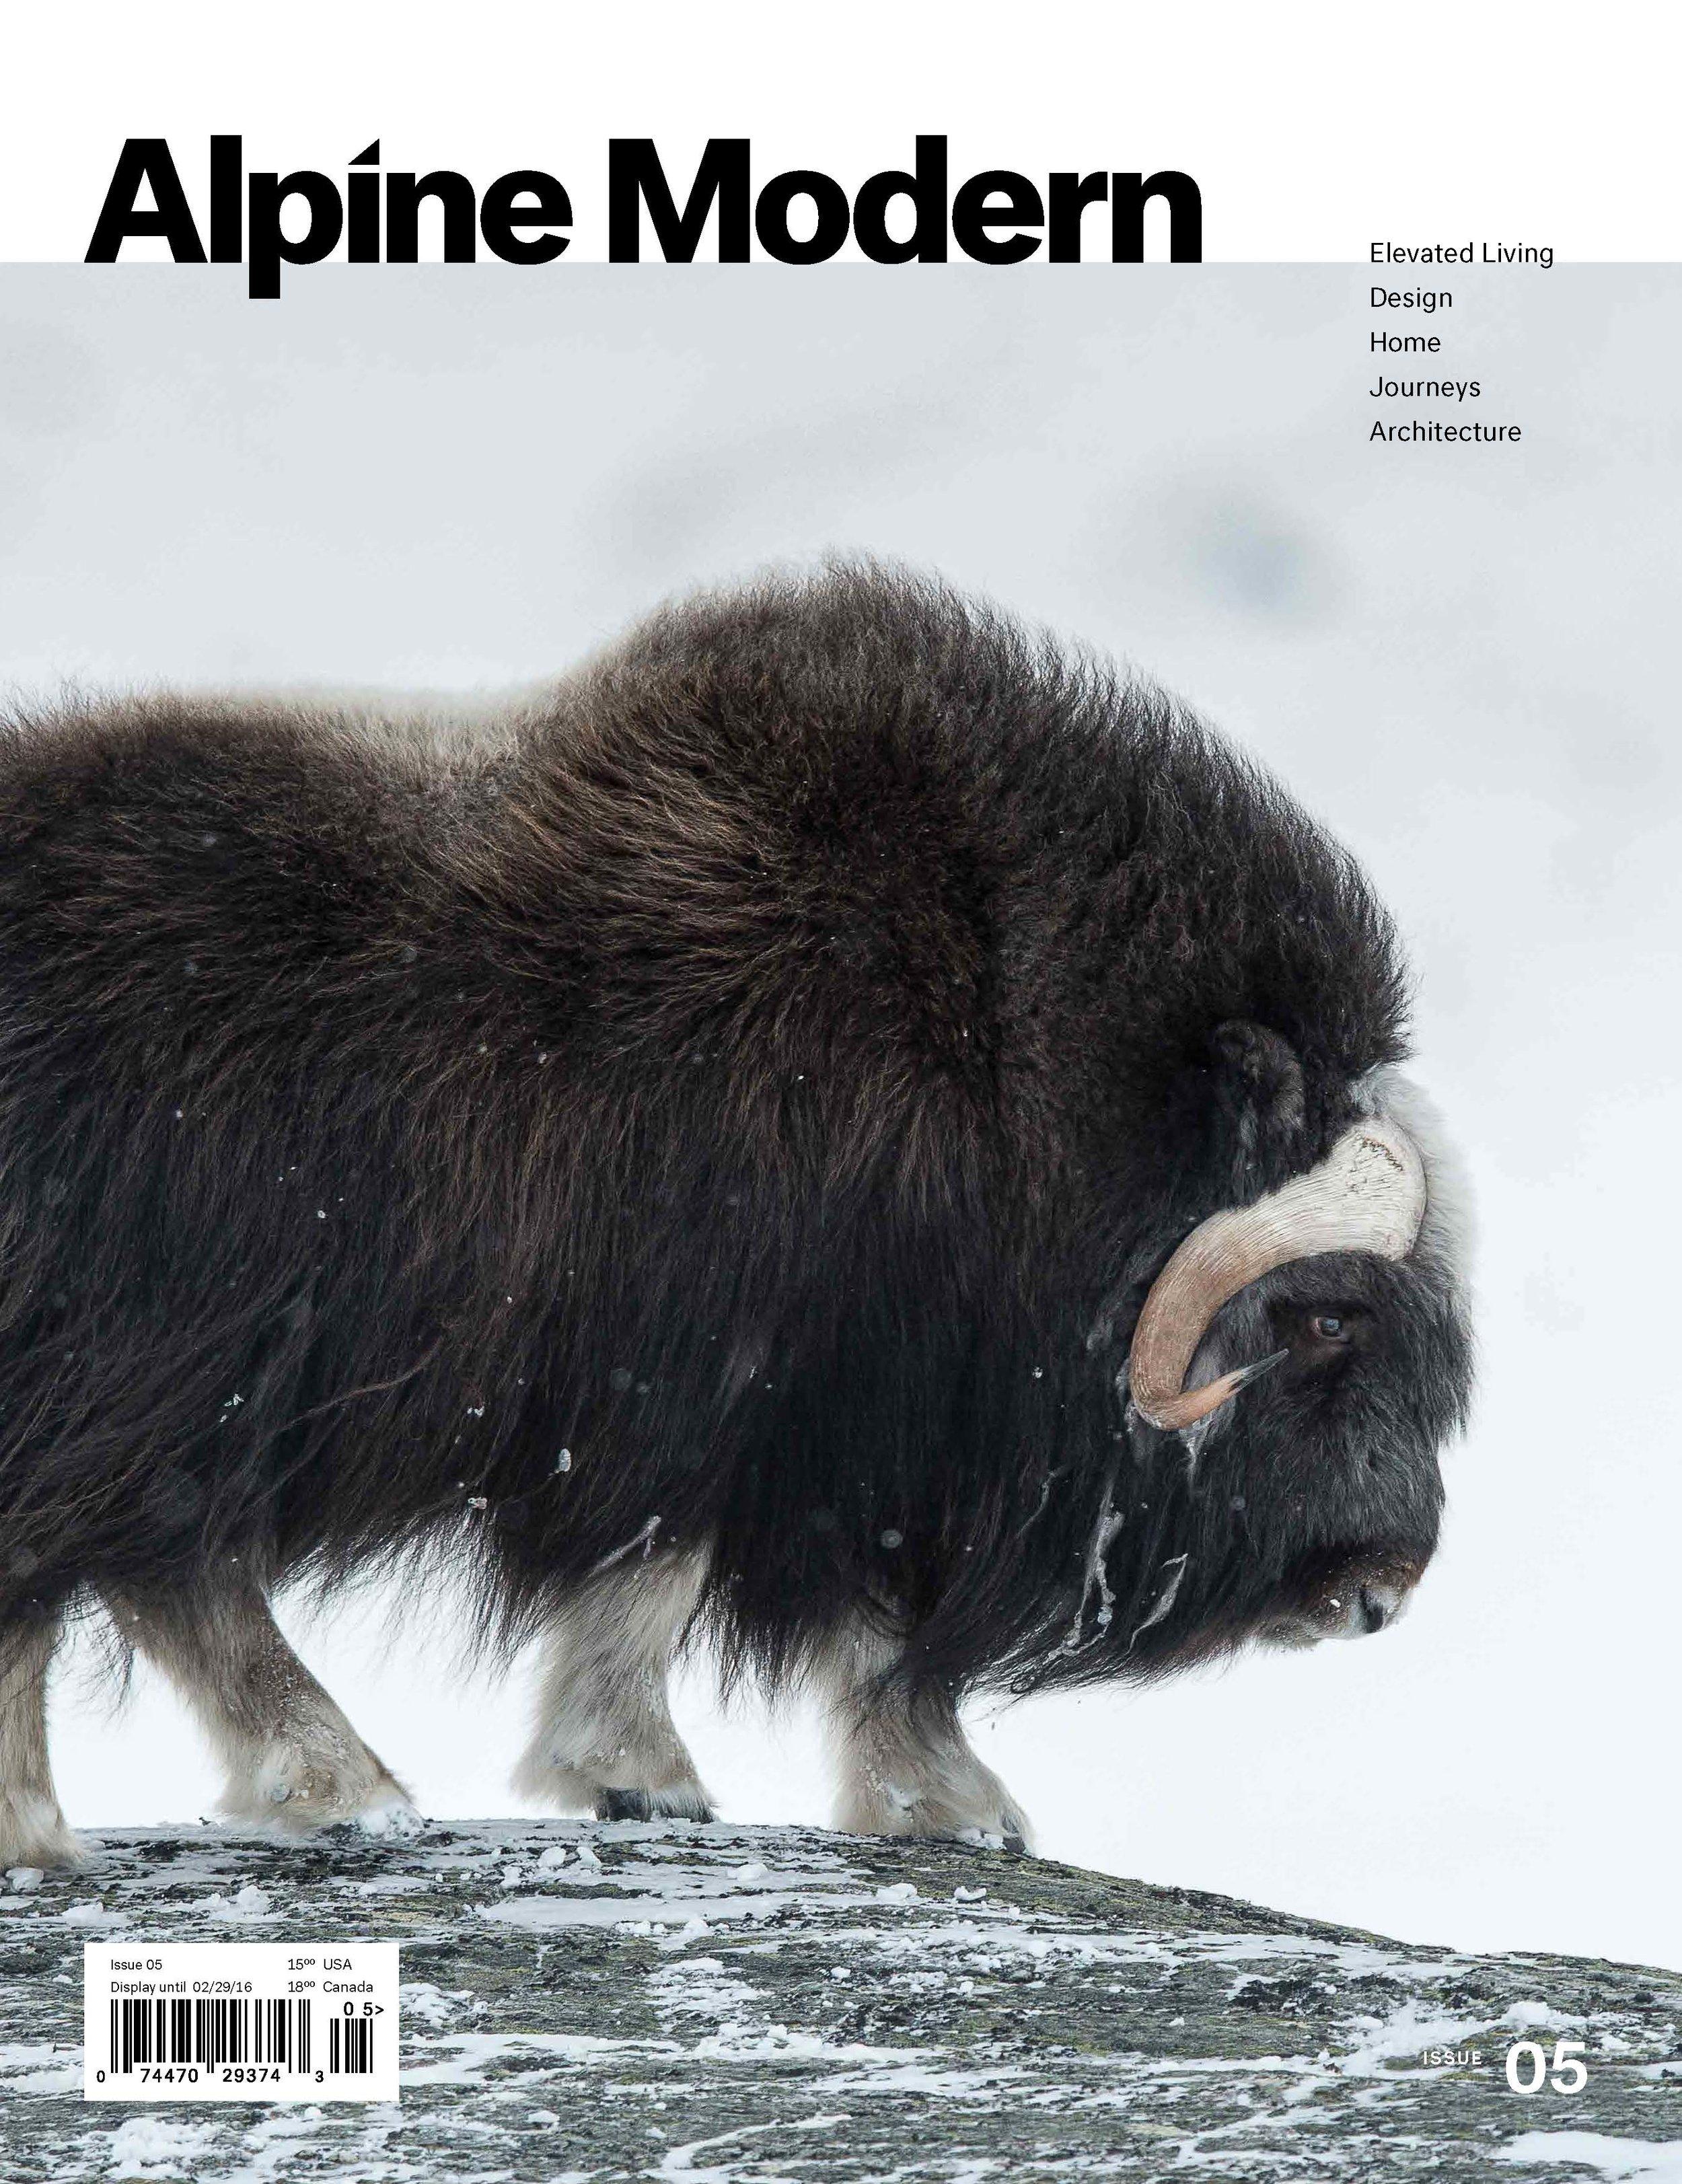 alpinemodern_quarterly_05_BackcountryHaven.jpg1111_Page_1.jpg